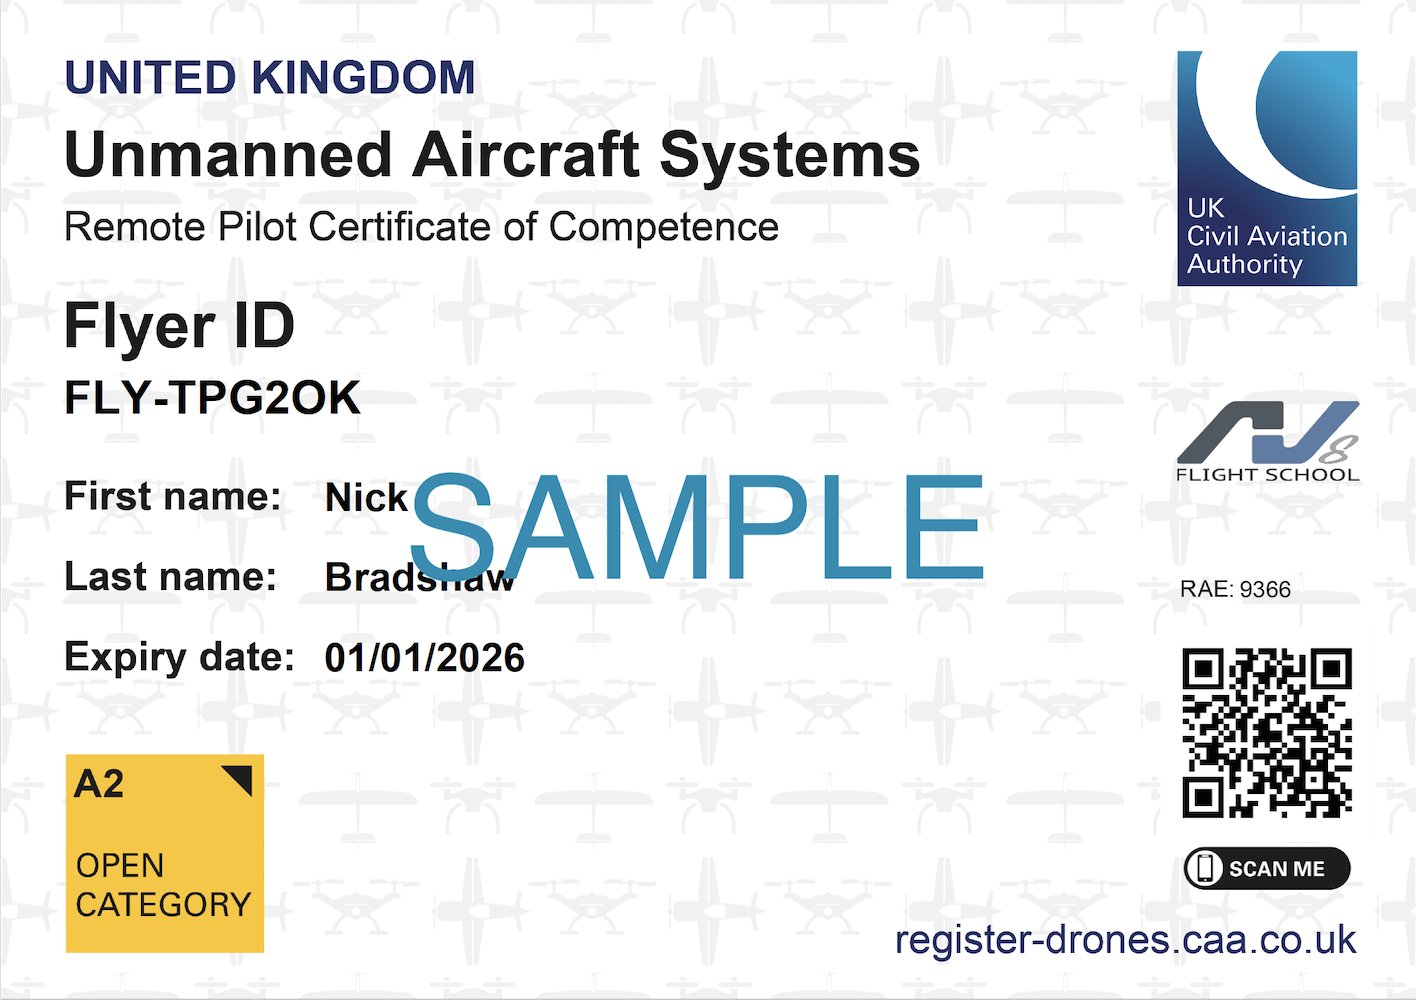 Formal CAA Certificate / ID Card